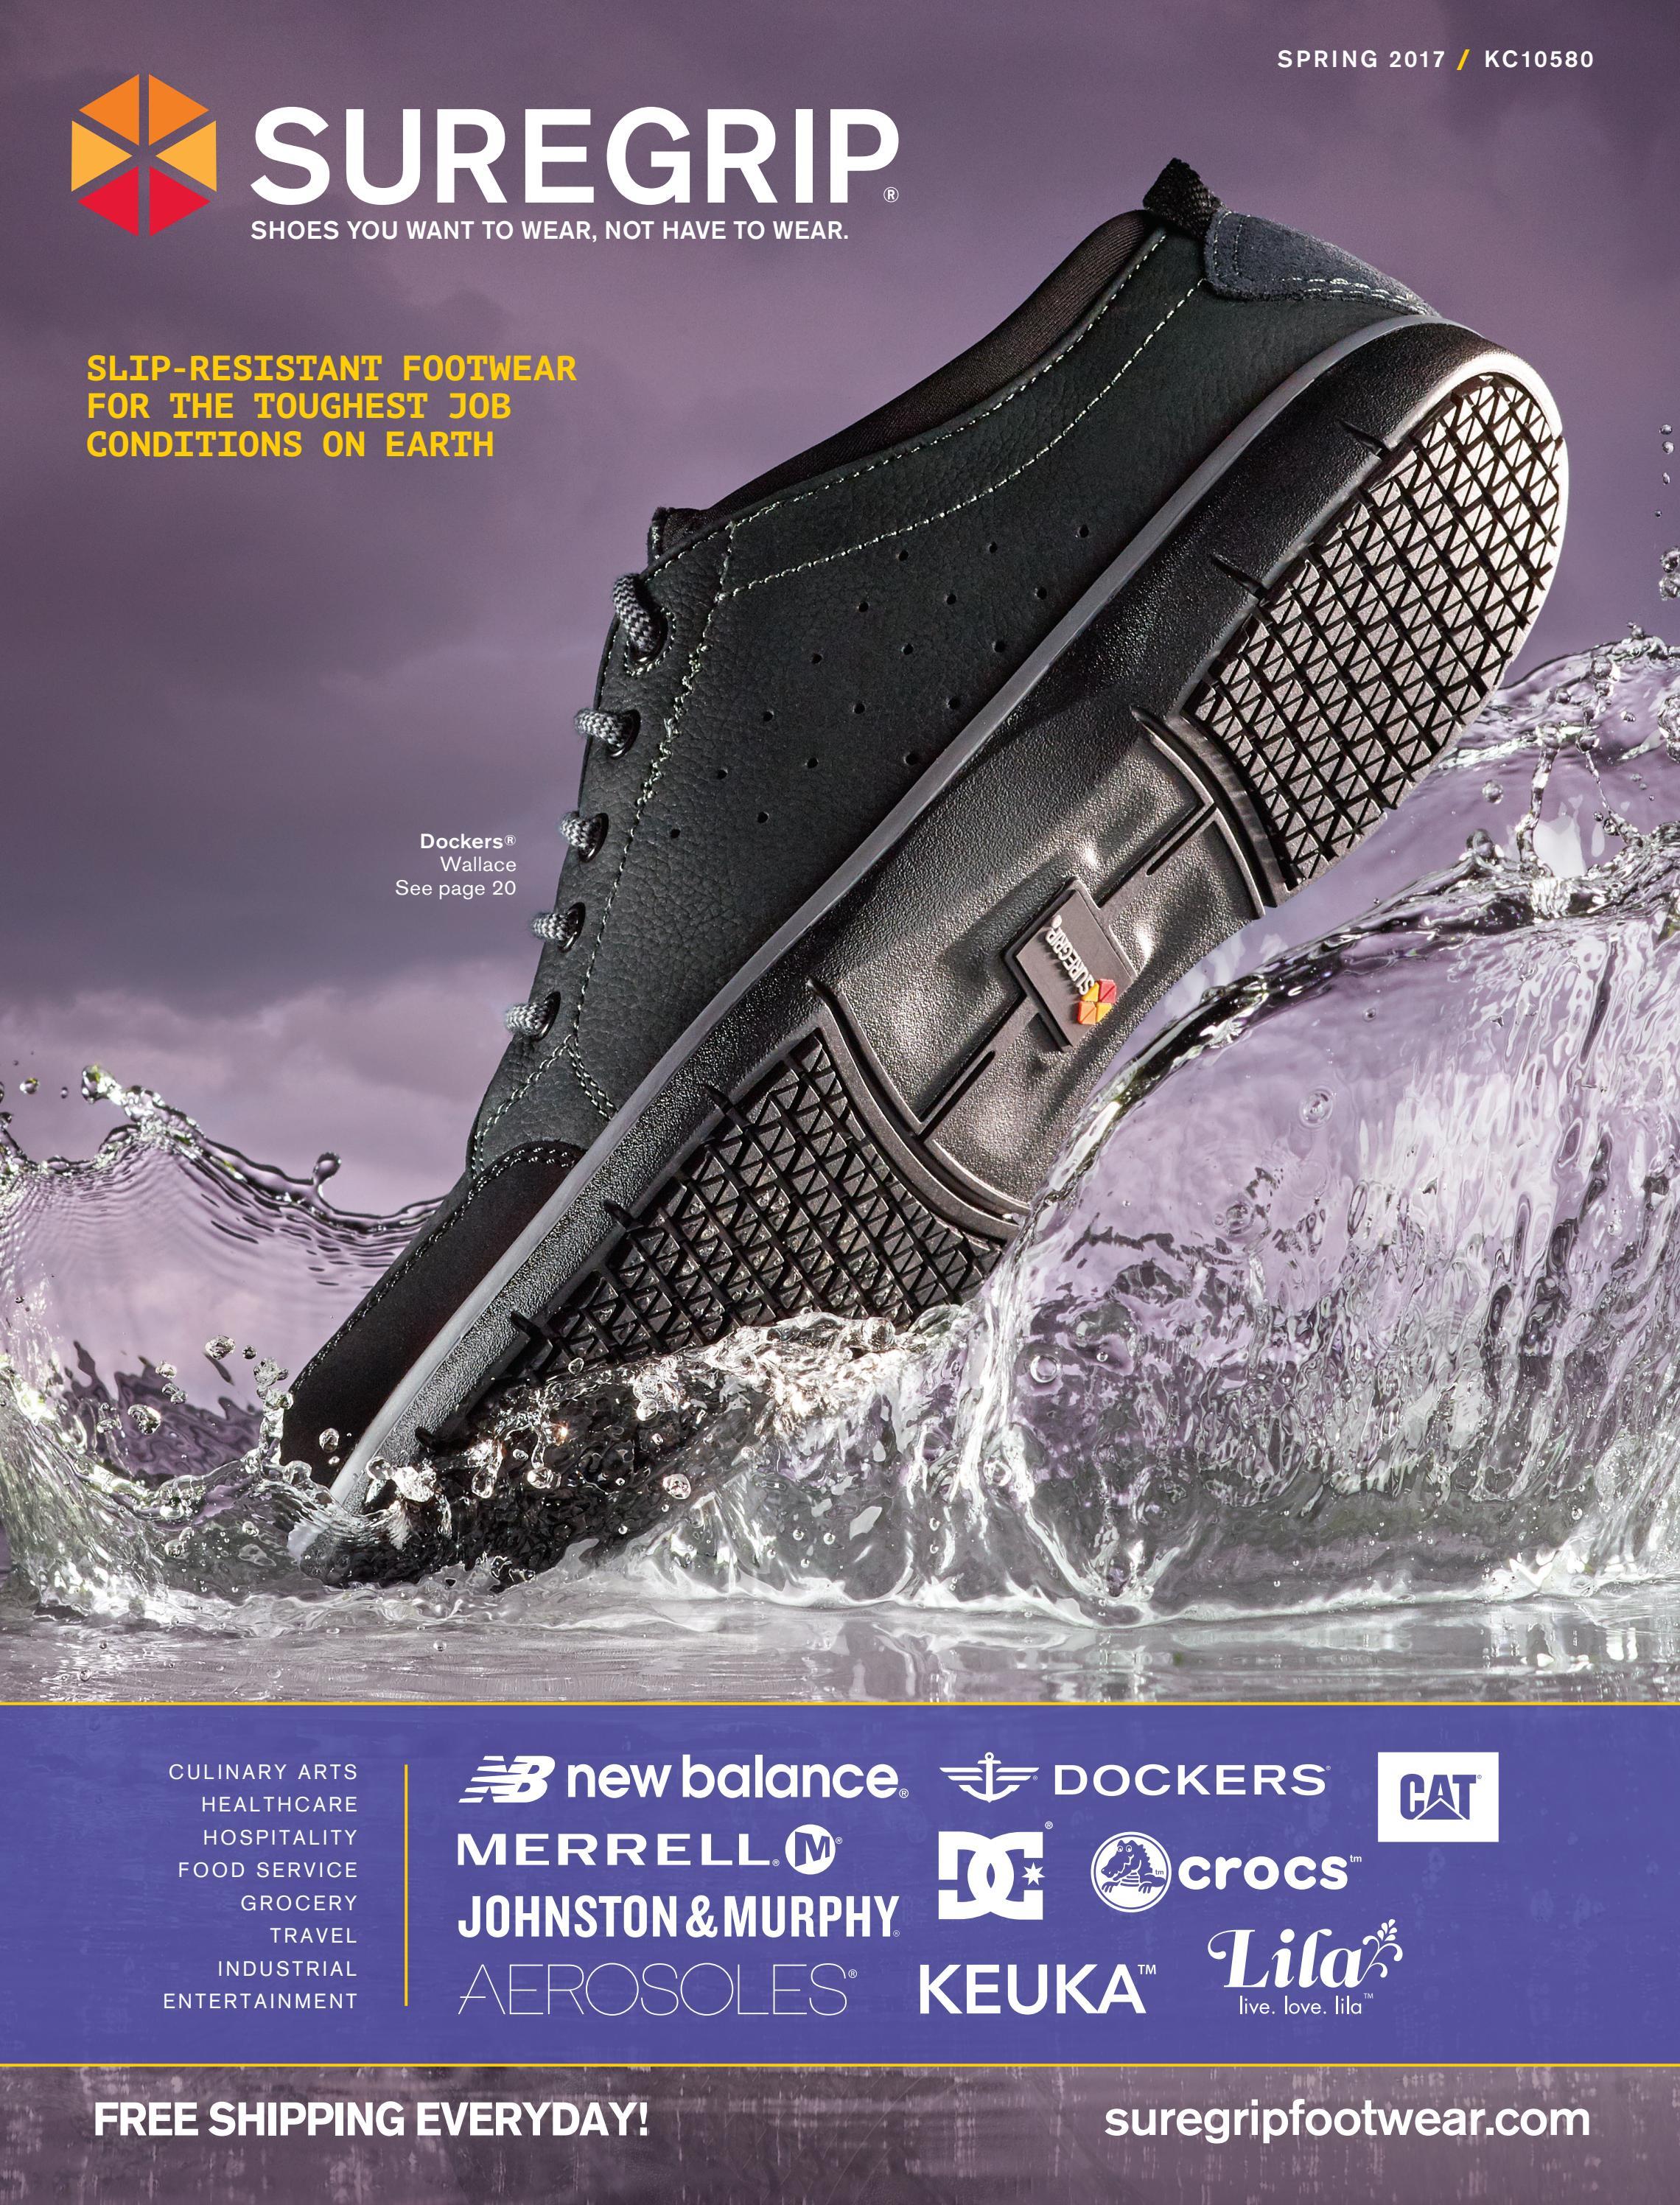 c9bf5d36 SureGrip Shoes Spring 2017 Retail Catalog by SureGrip Footwear - issuu